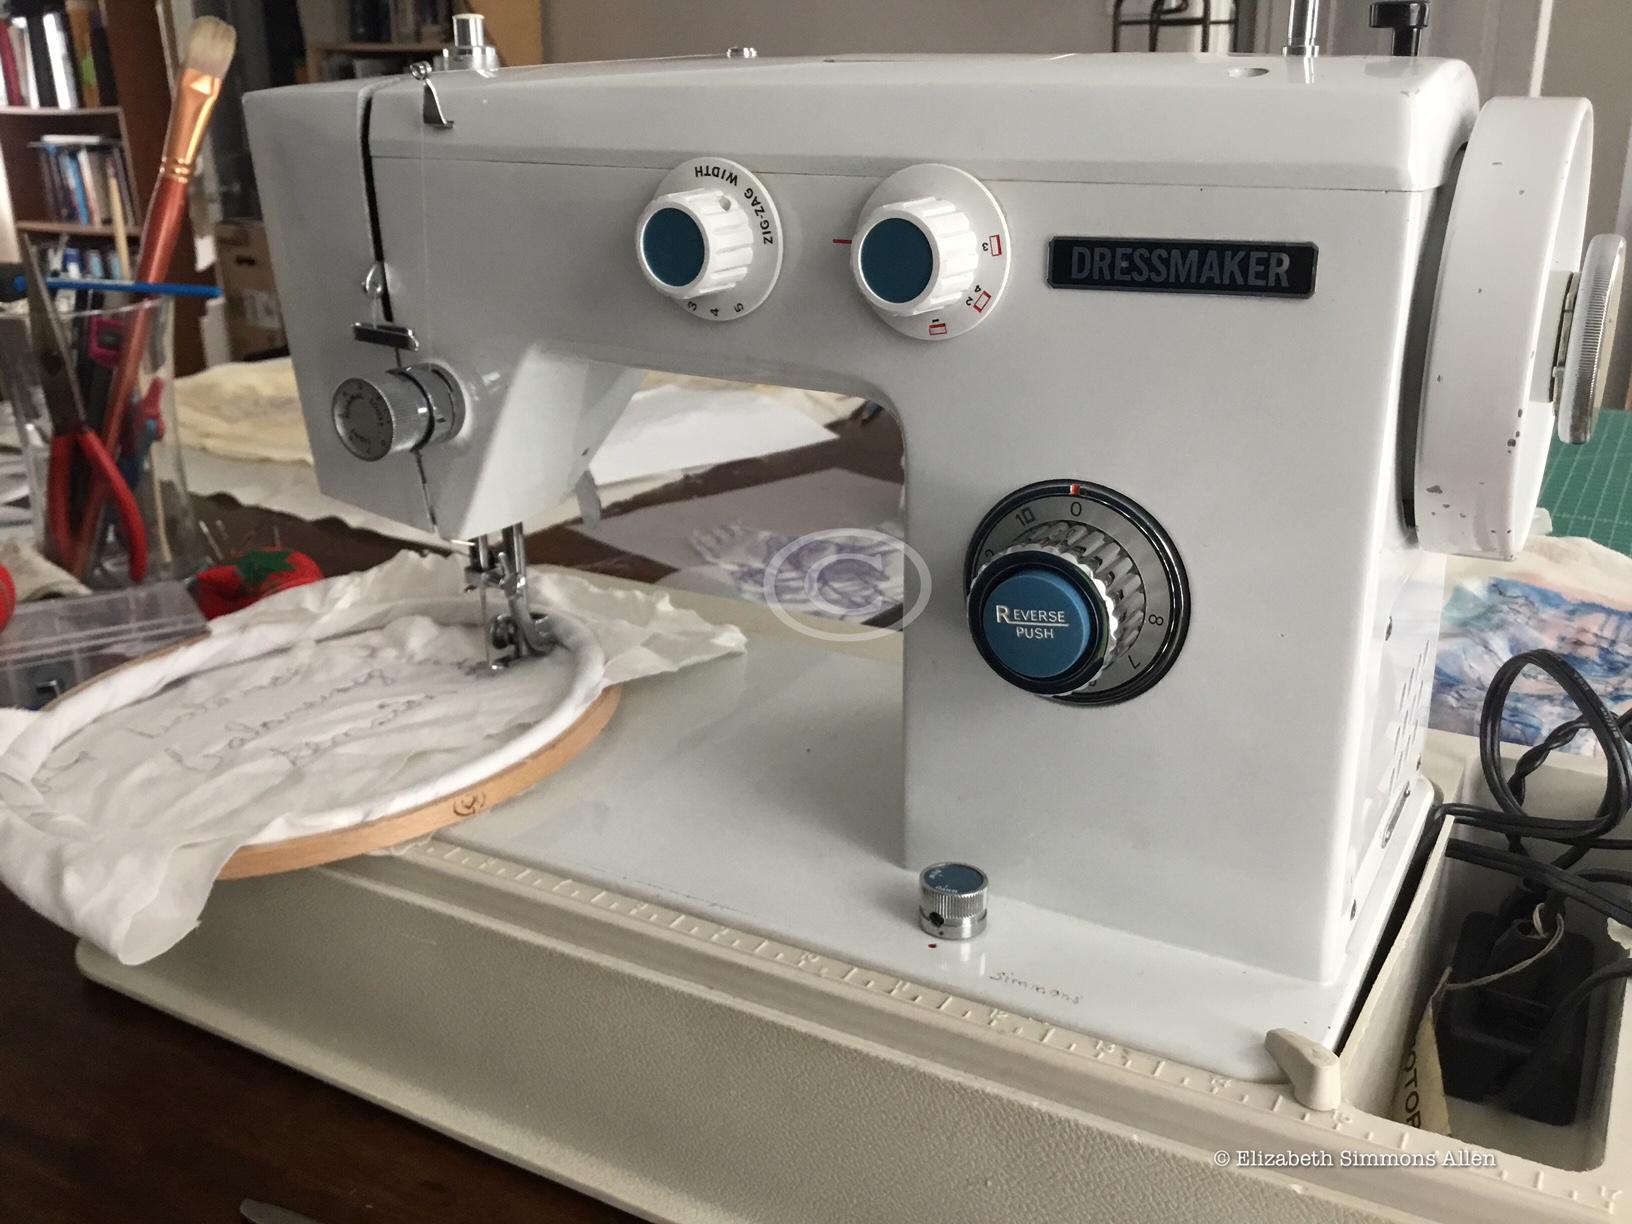 sewingmachinebalance.jpg